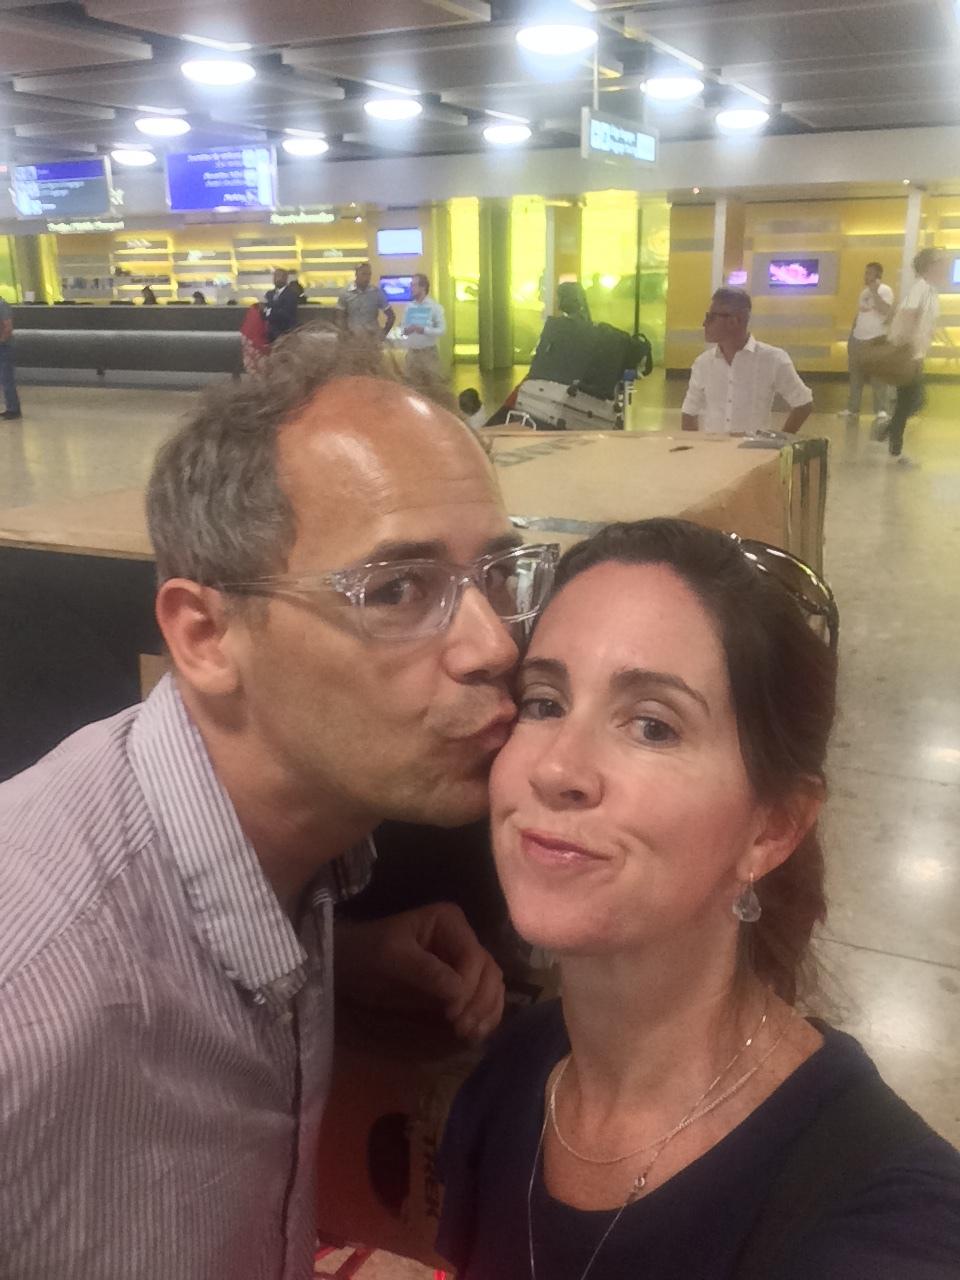 man kissing wife on cheek